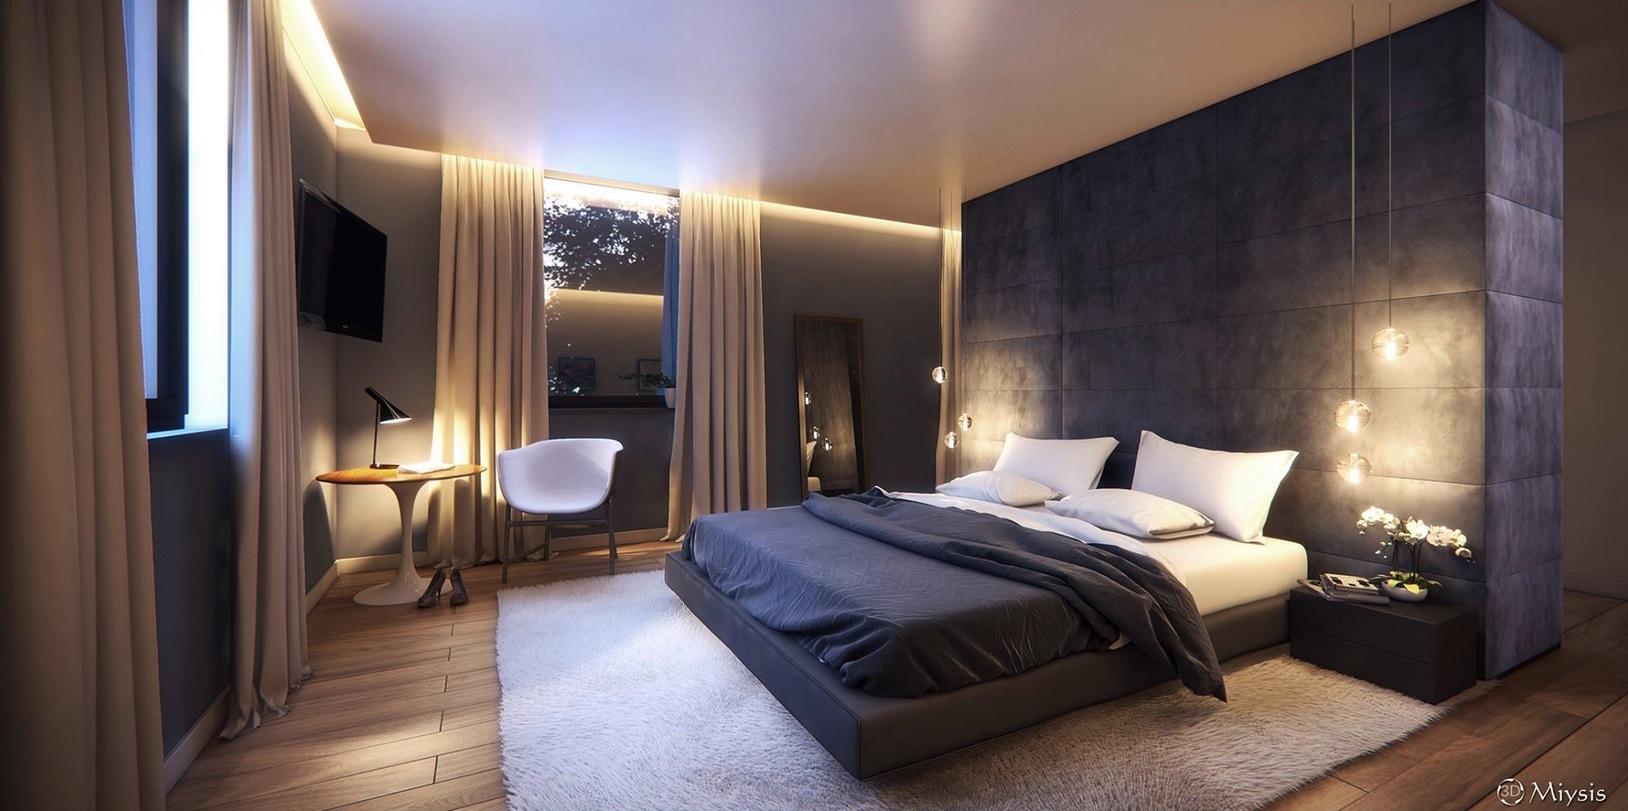 Best Kitchen Gallery: Interior Bedroom Design Yuliya Rastorguyeva Modern Minimalist of Bedroom Designes  on rachelxblog.com